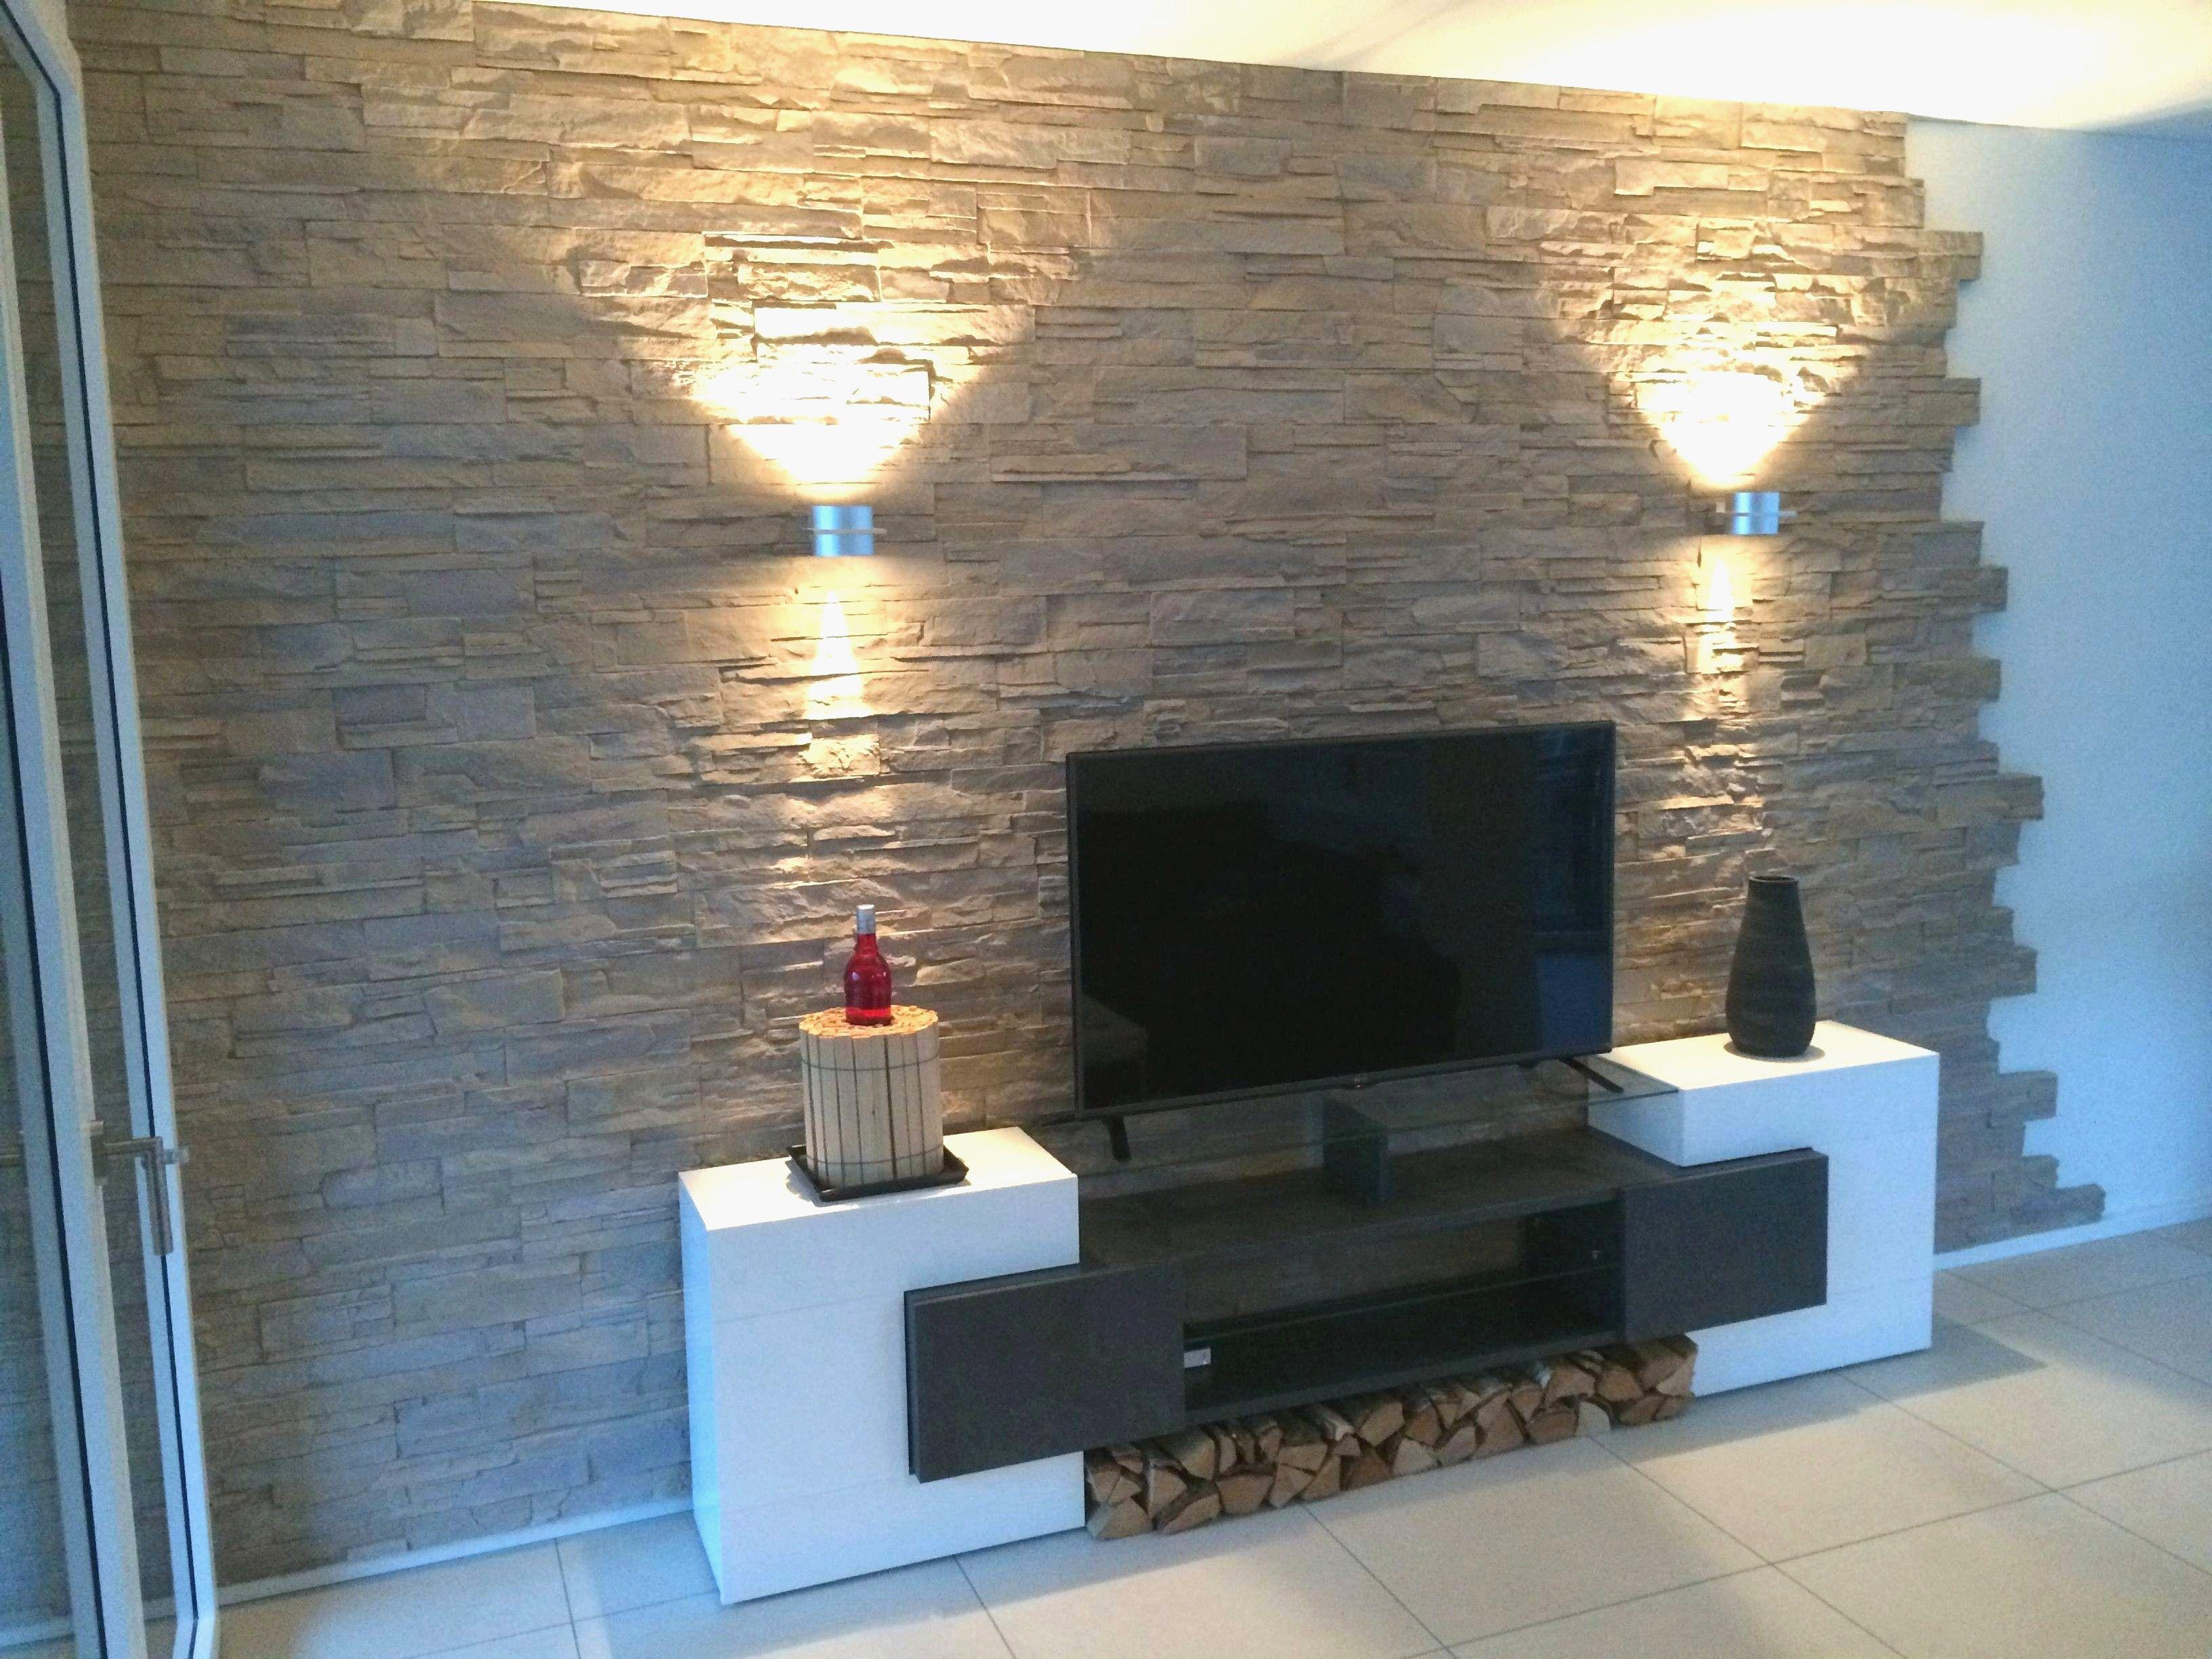 Wohnzimmer Deko Tapete Stone Wall Living Room Decorative Stone Wall Stylish Living Room